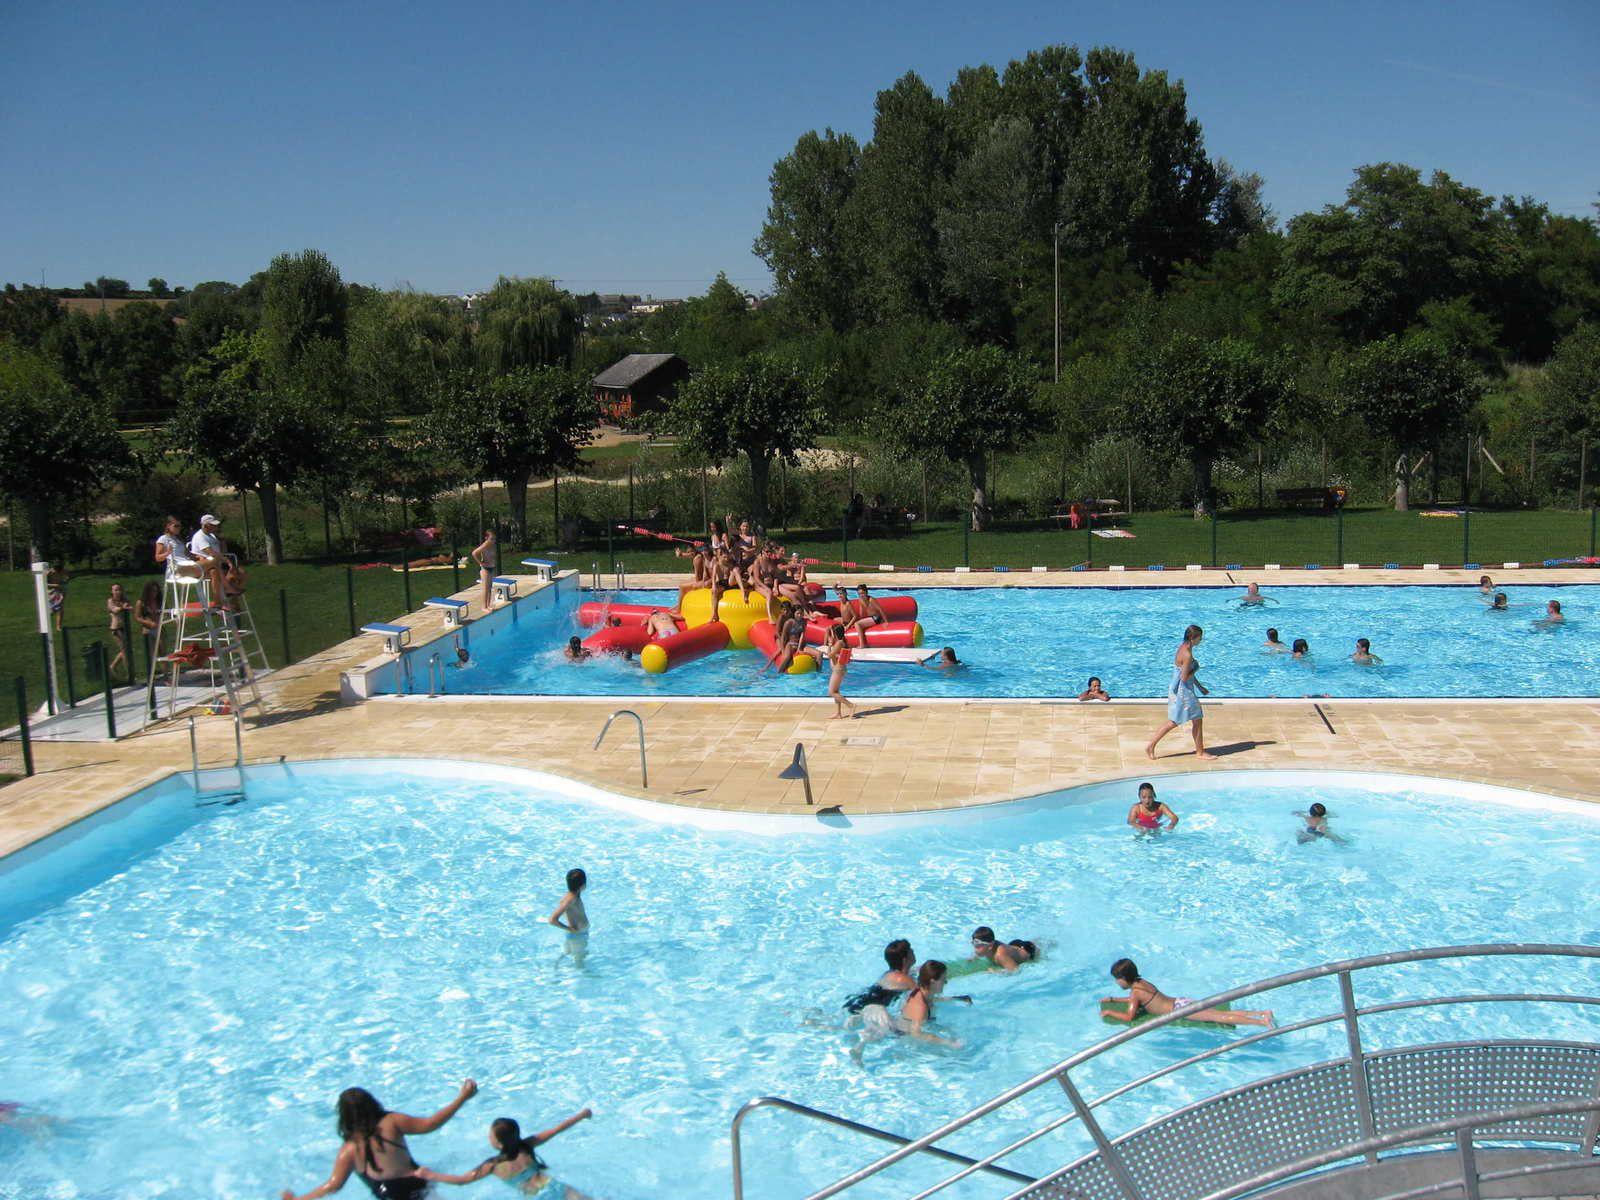 Saint-Paterne-Racan : Information piscine